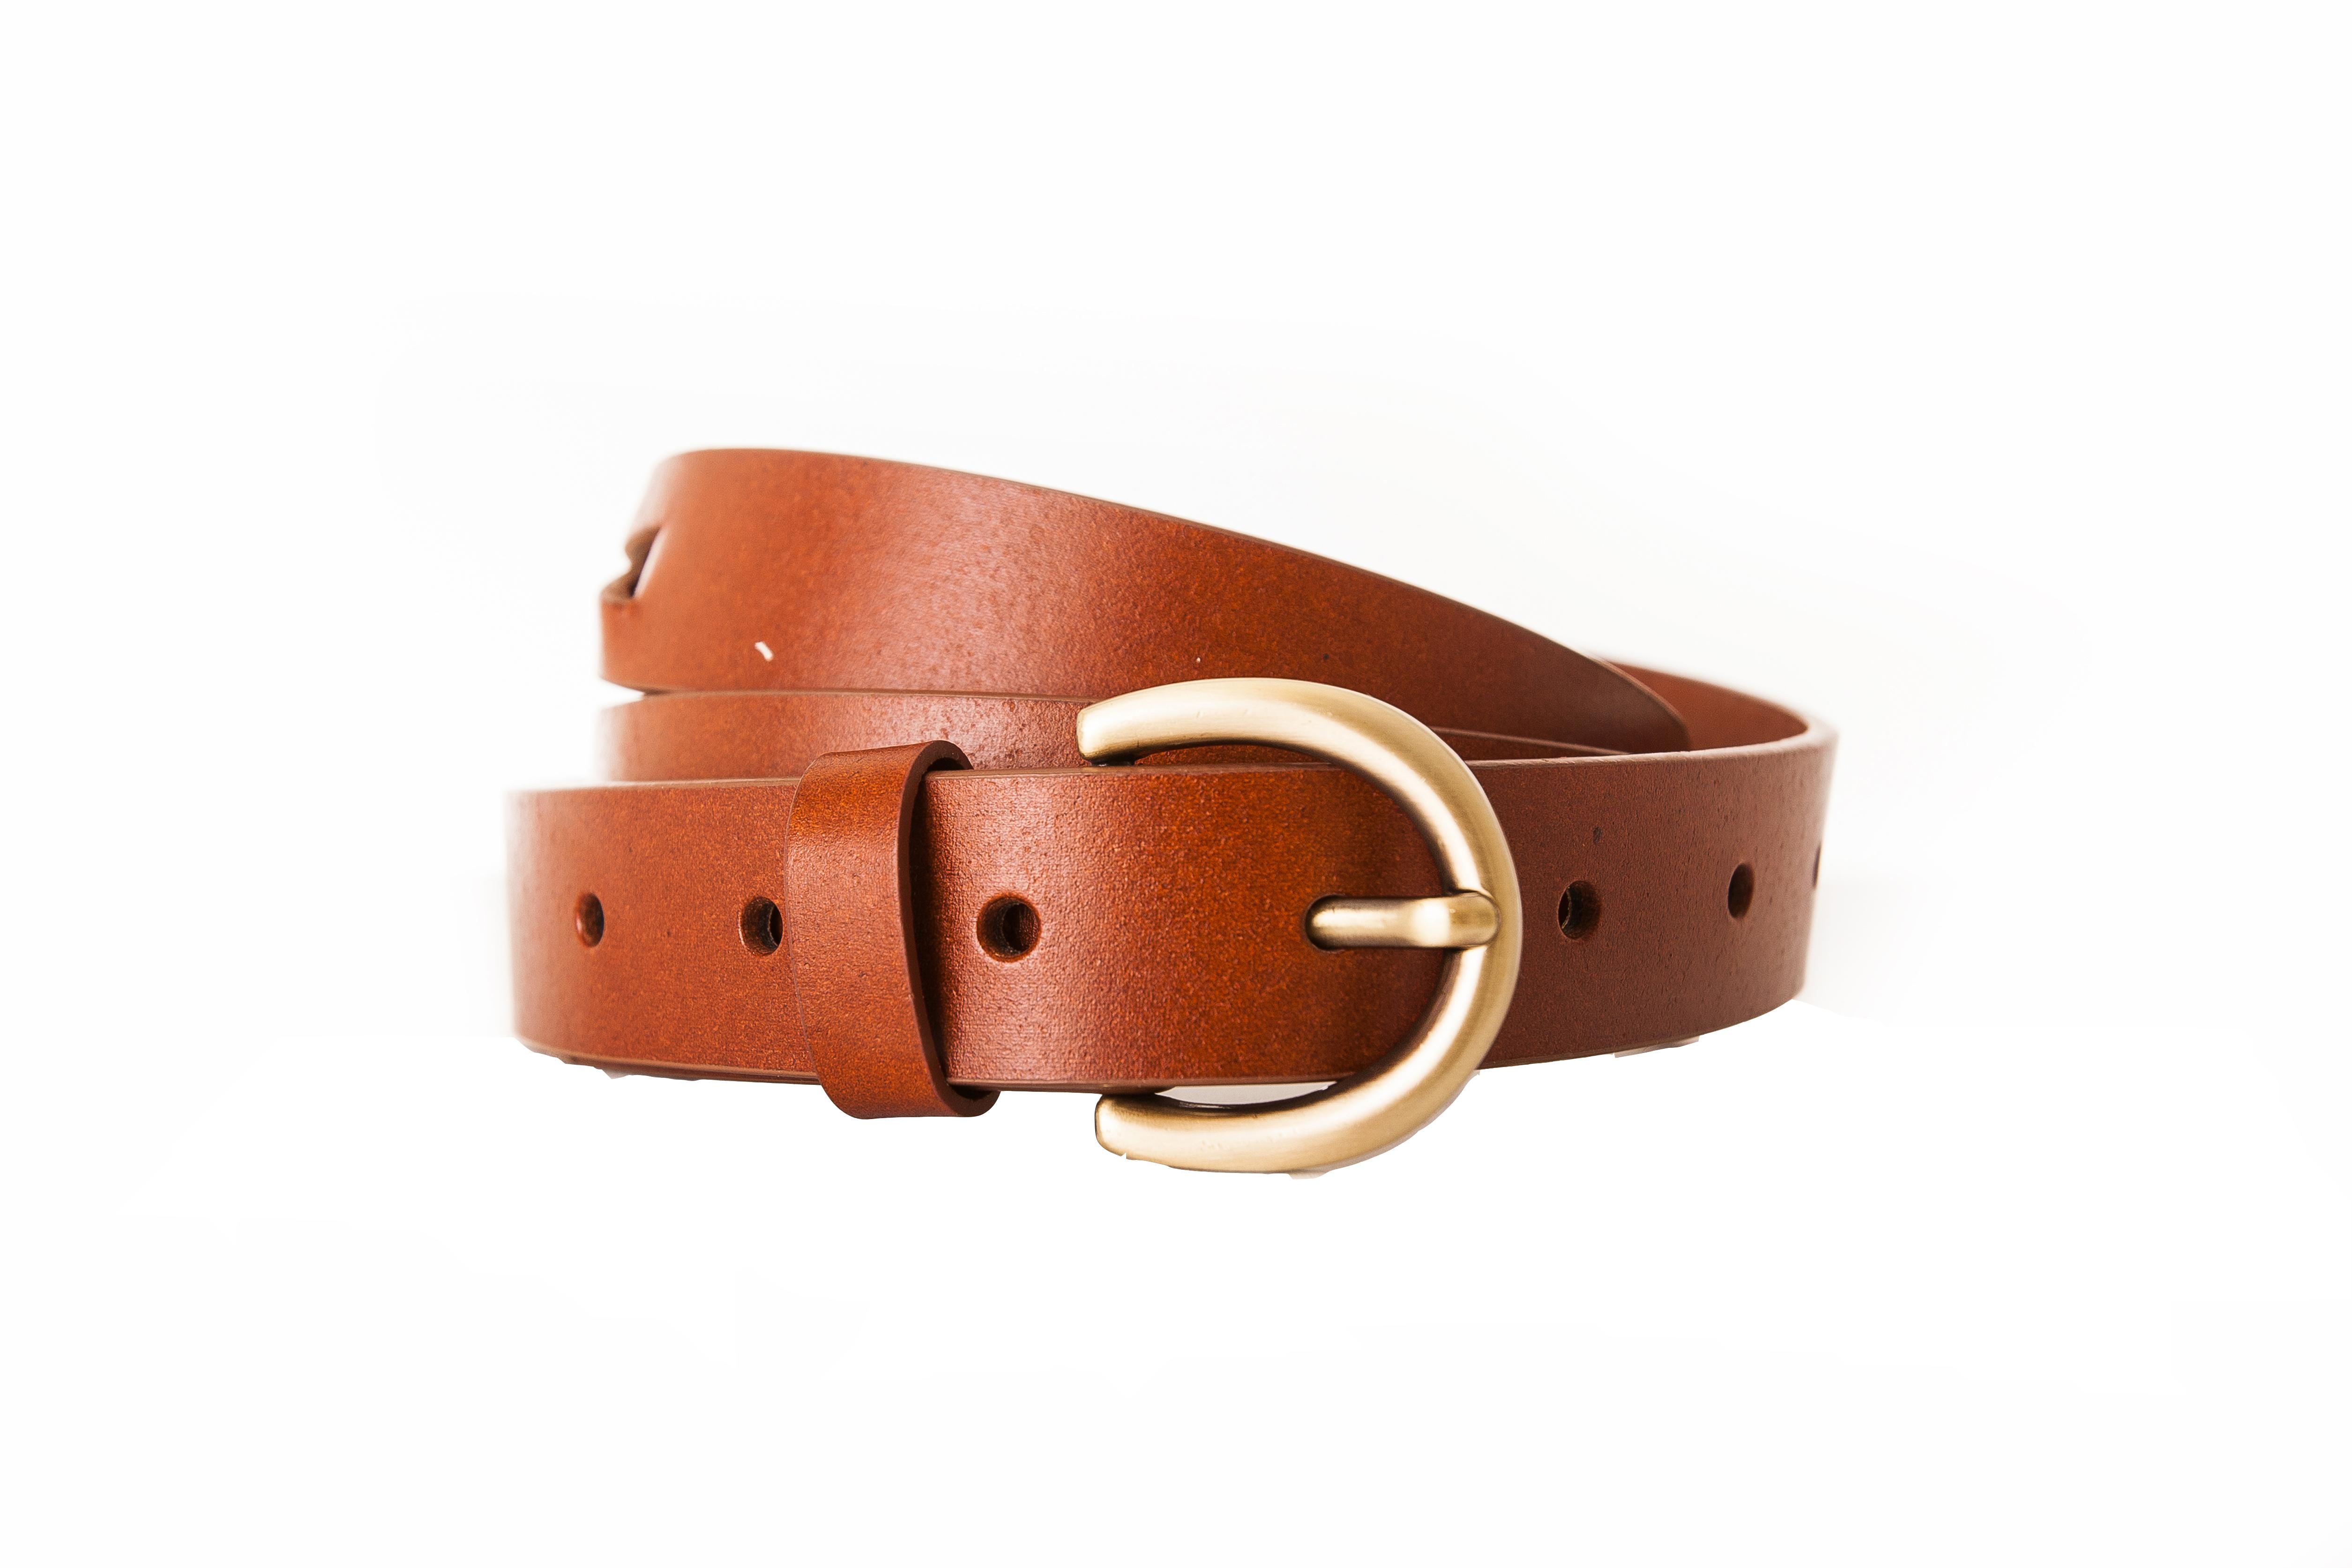 Plus-size women's belts for plus size women, including: Reversible Belt Black - Clearance, Studded Cutout Pant Belt Black - Clearance, Blue Stripe Stretch Belt - Accessories, Gold Multi Chain Belt - Accessories, Pearl Flower Stretch Belt Multi - Clearance.